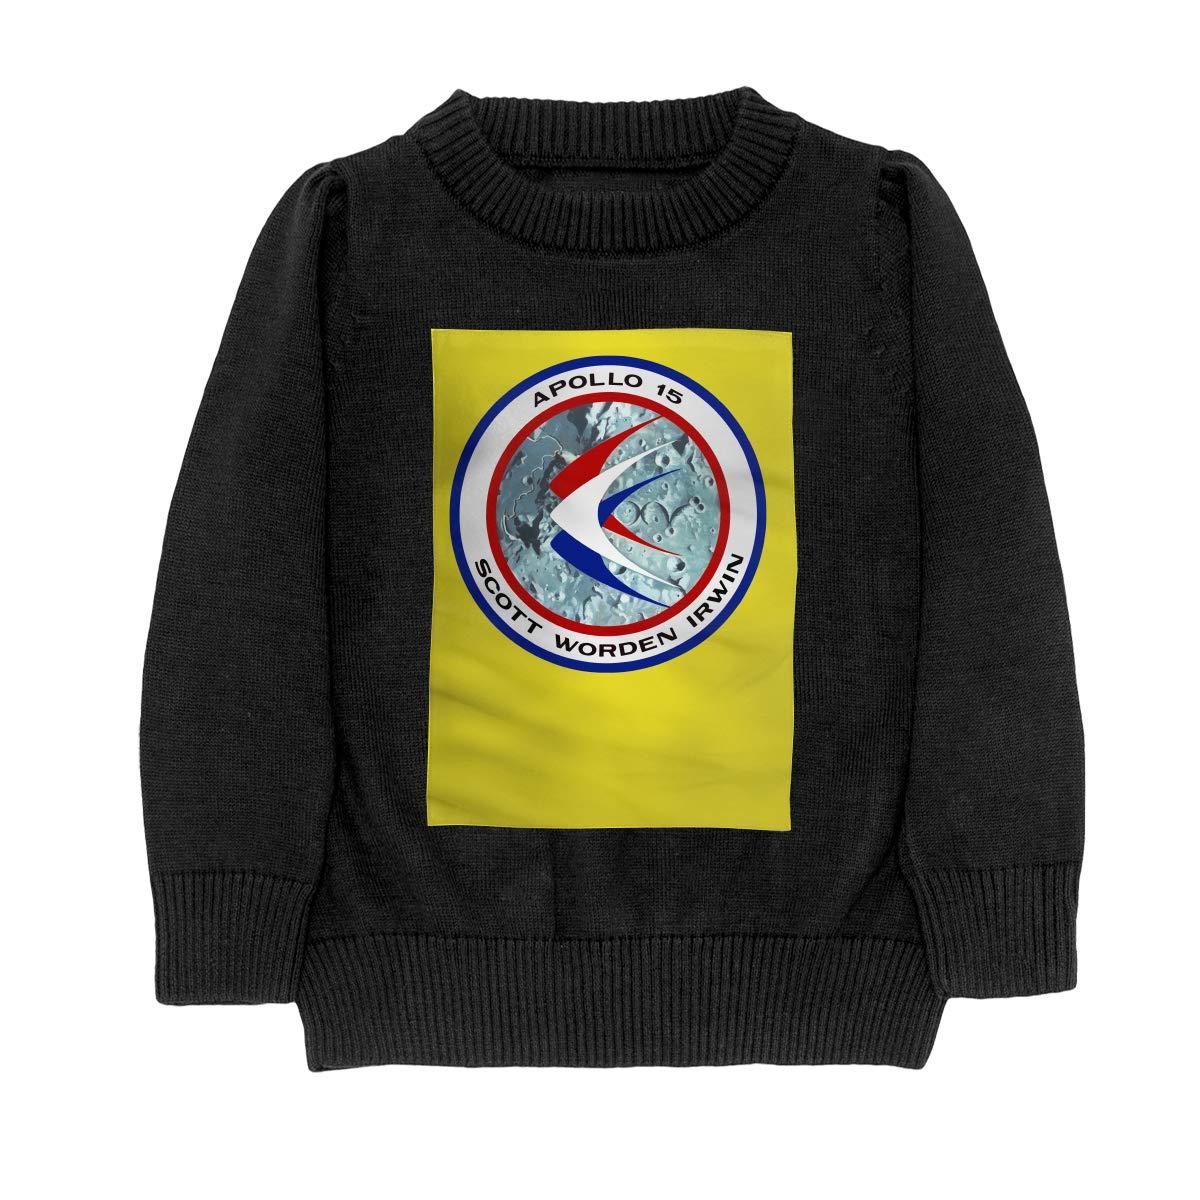 Apollo 15 Insignia Fashion Adolescent Boys Girls Unisex Sweater Keep Warm